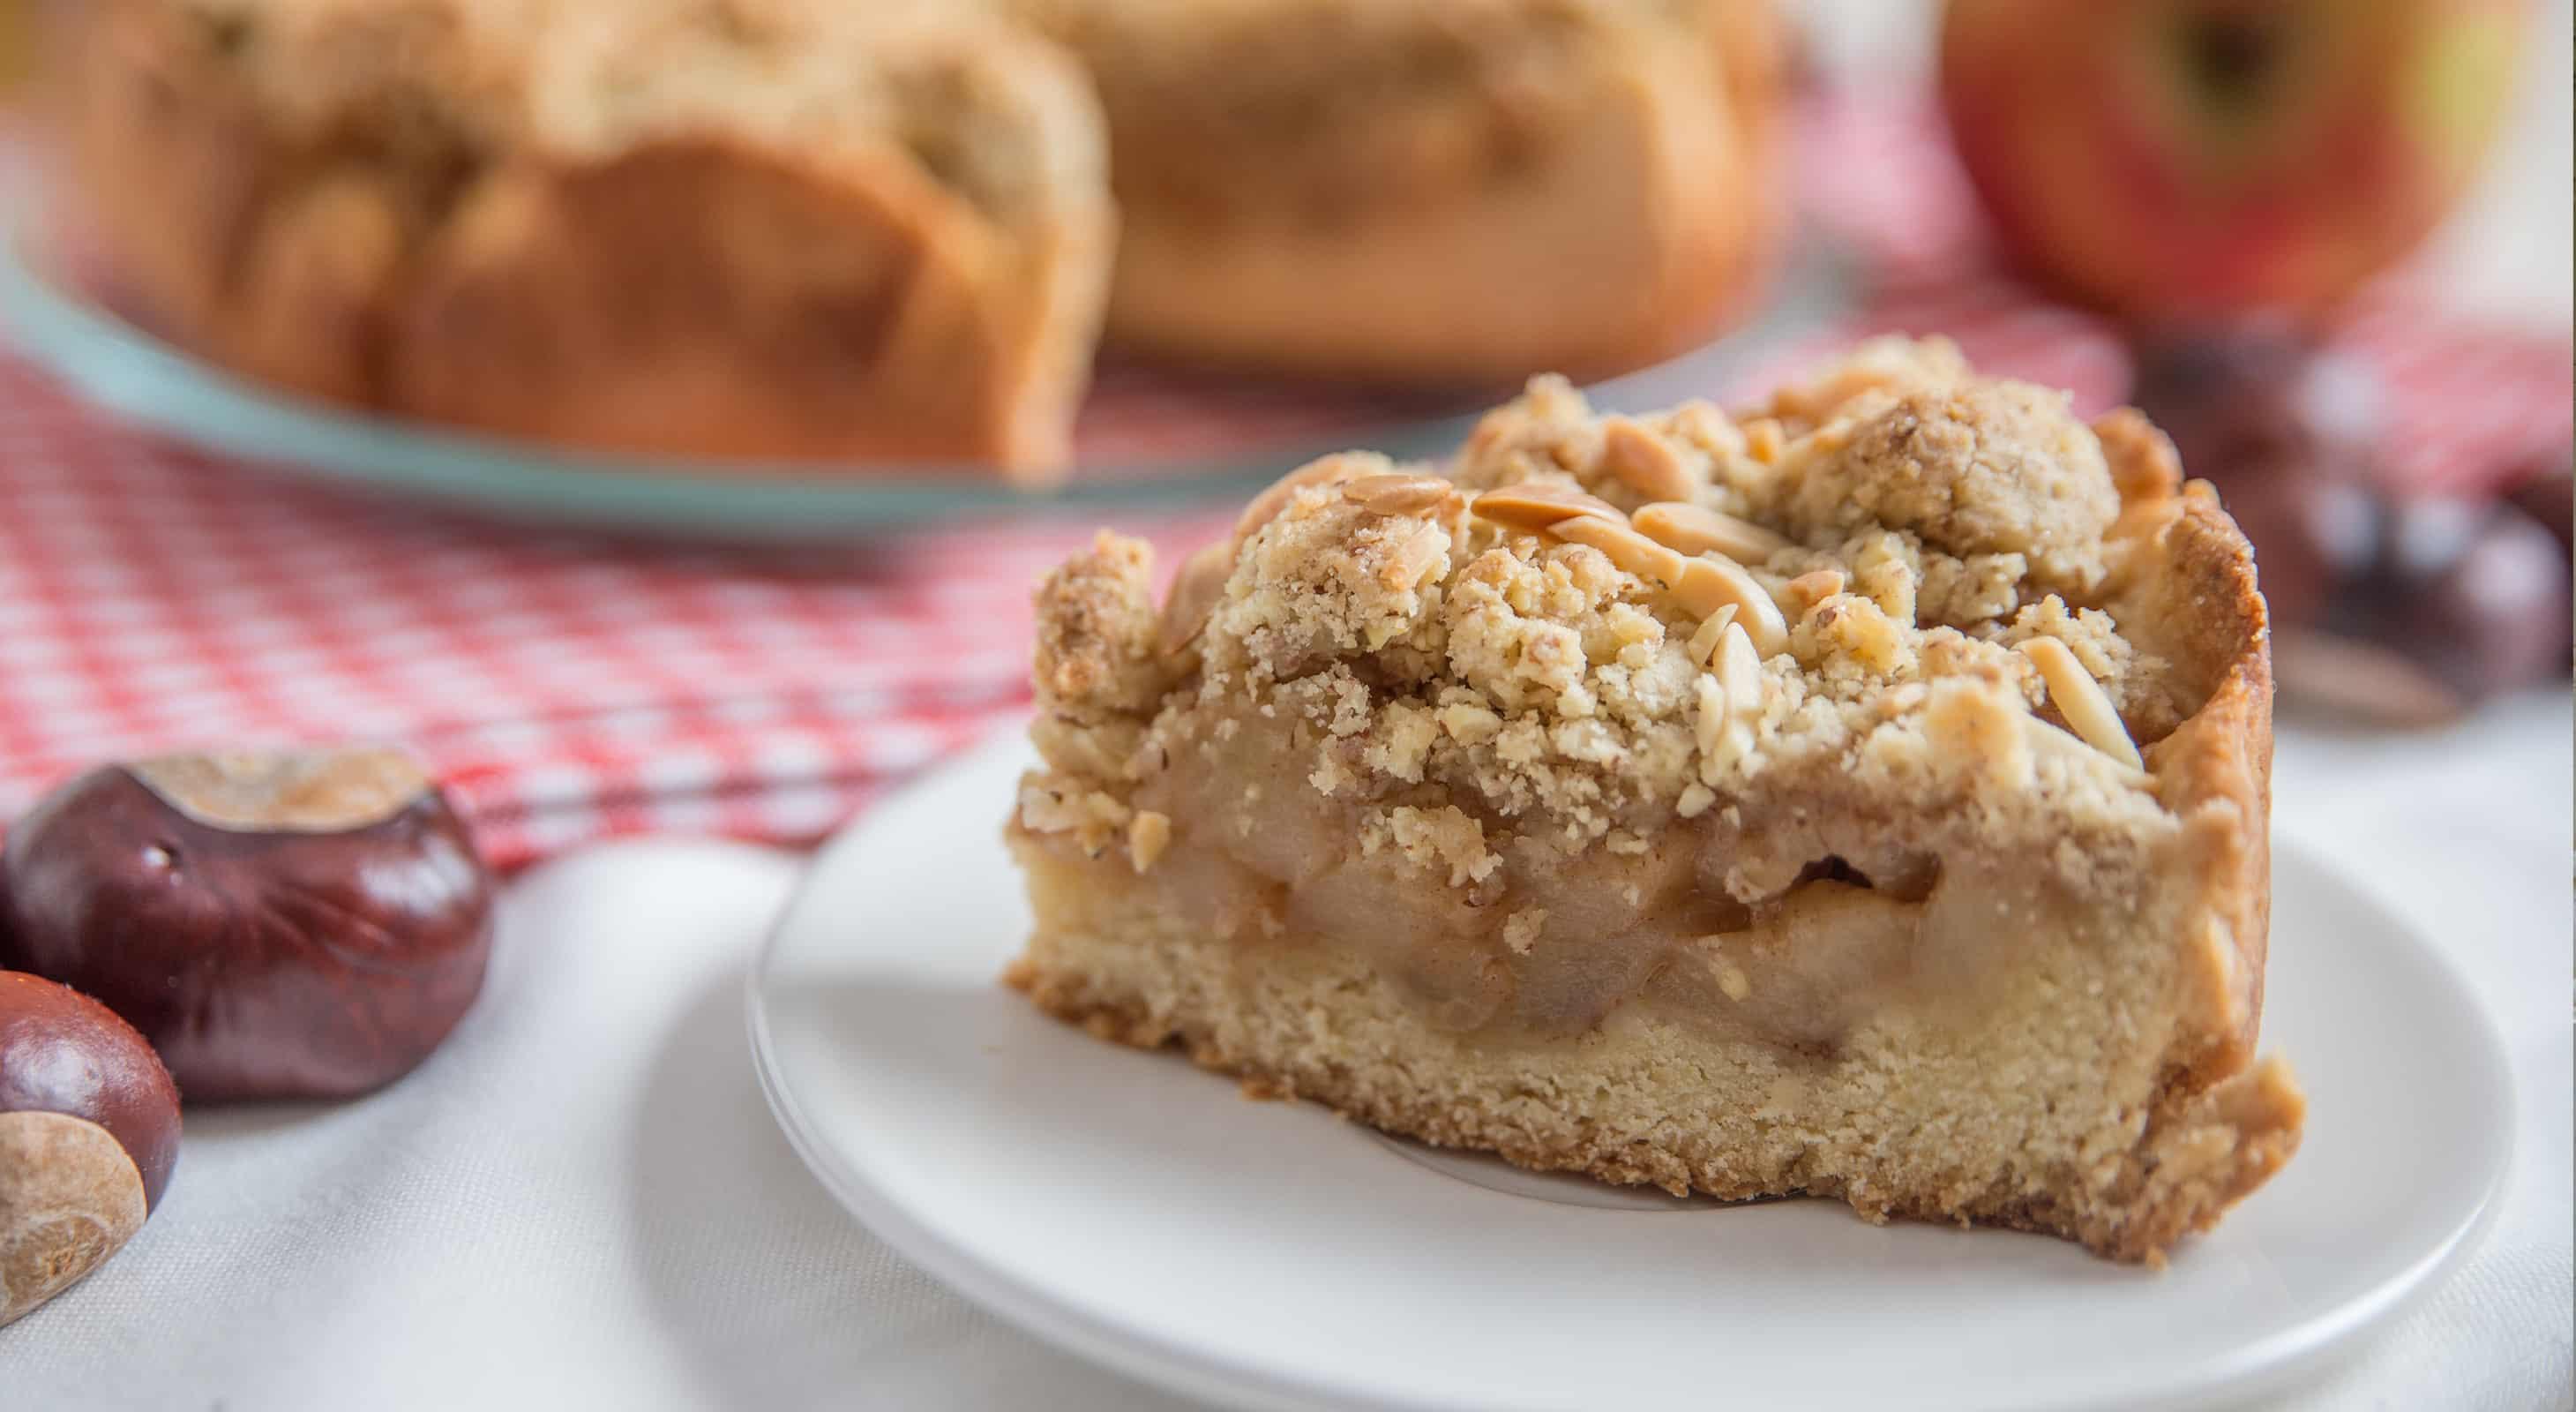 Slice of Streusel Apple Pie